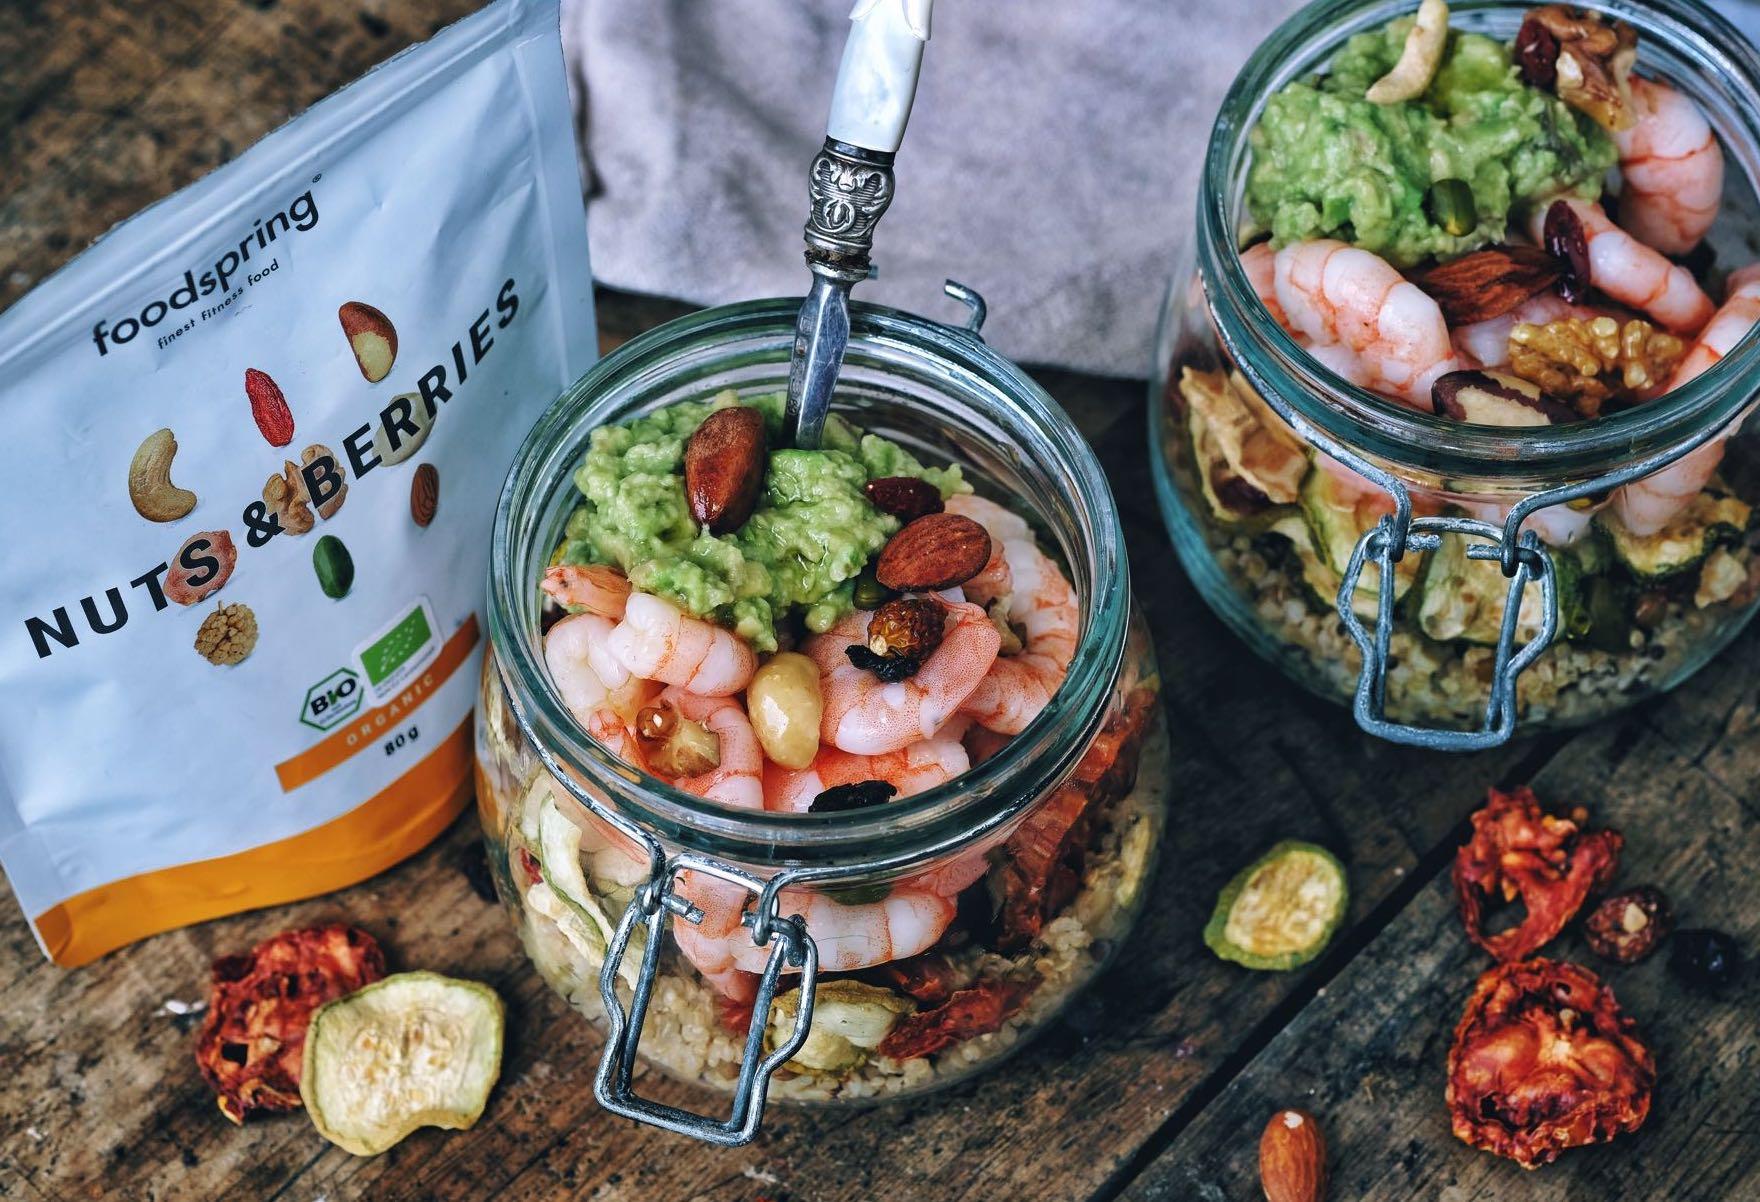 insalata in vaso.jpg